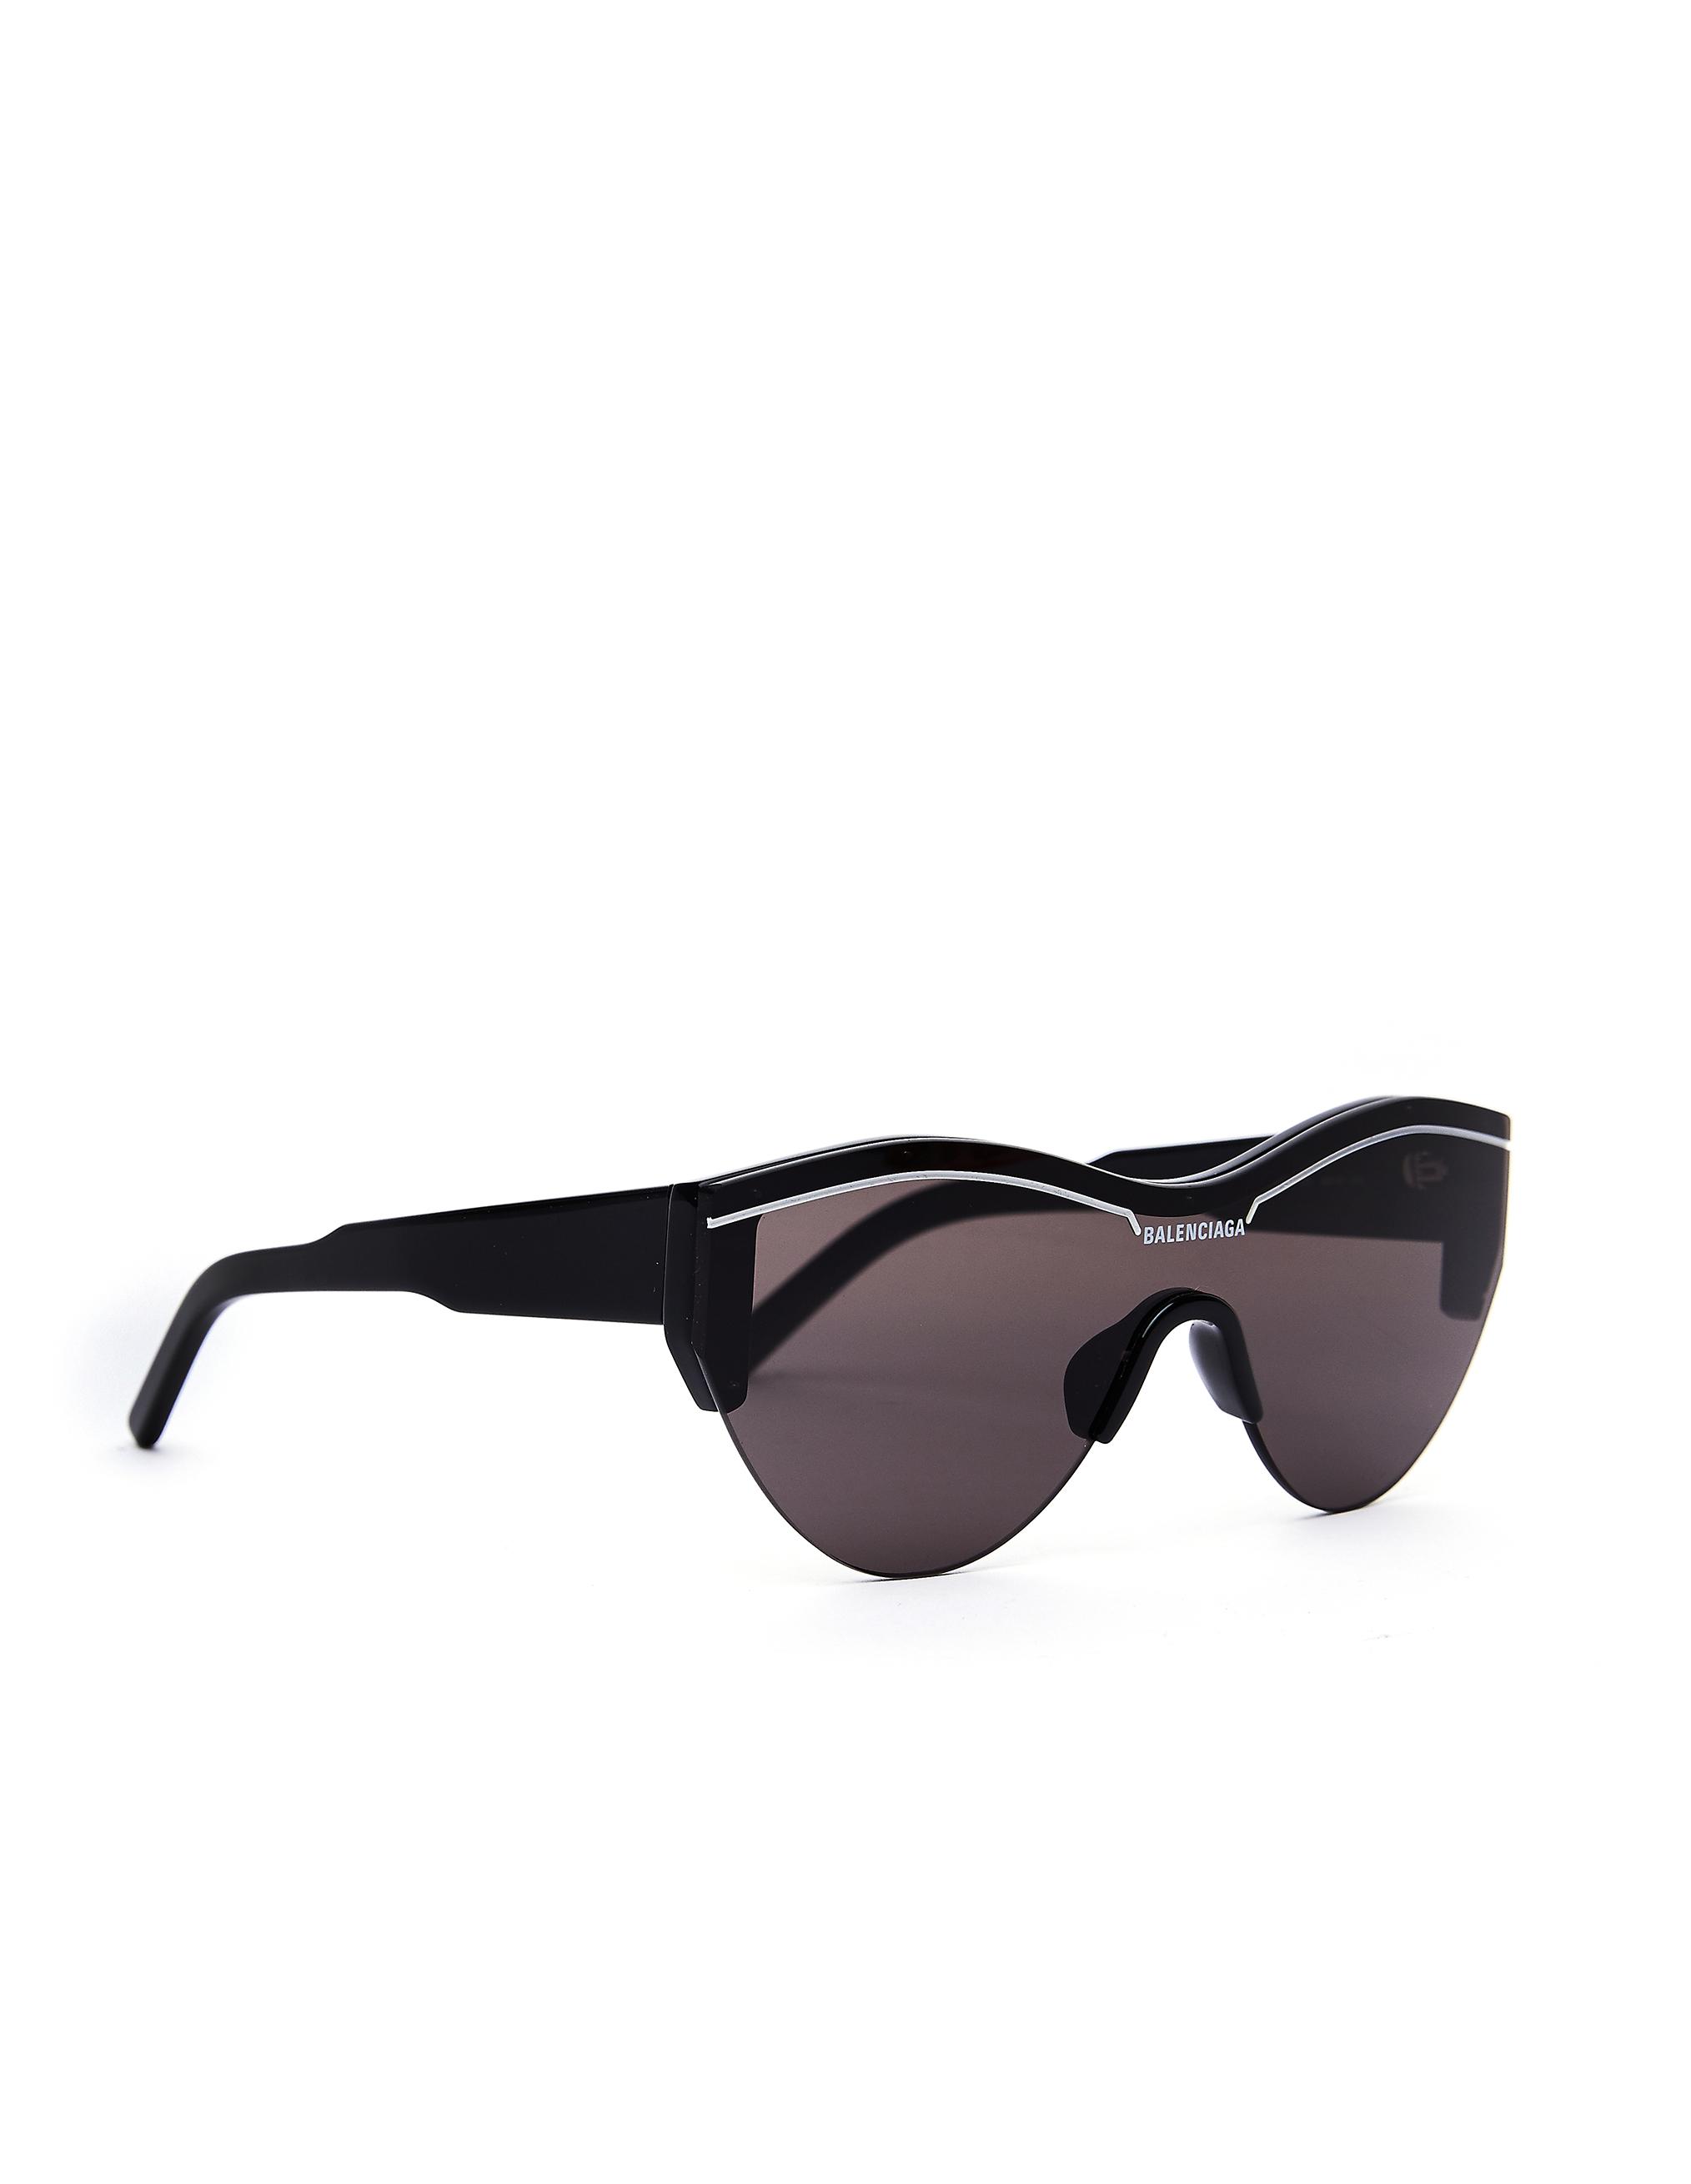 Balenciaga Black Ski Cat Sunglasses